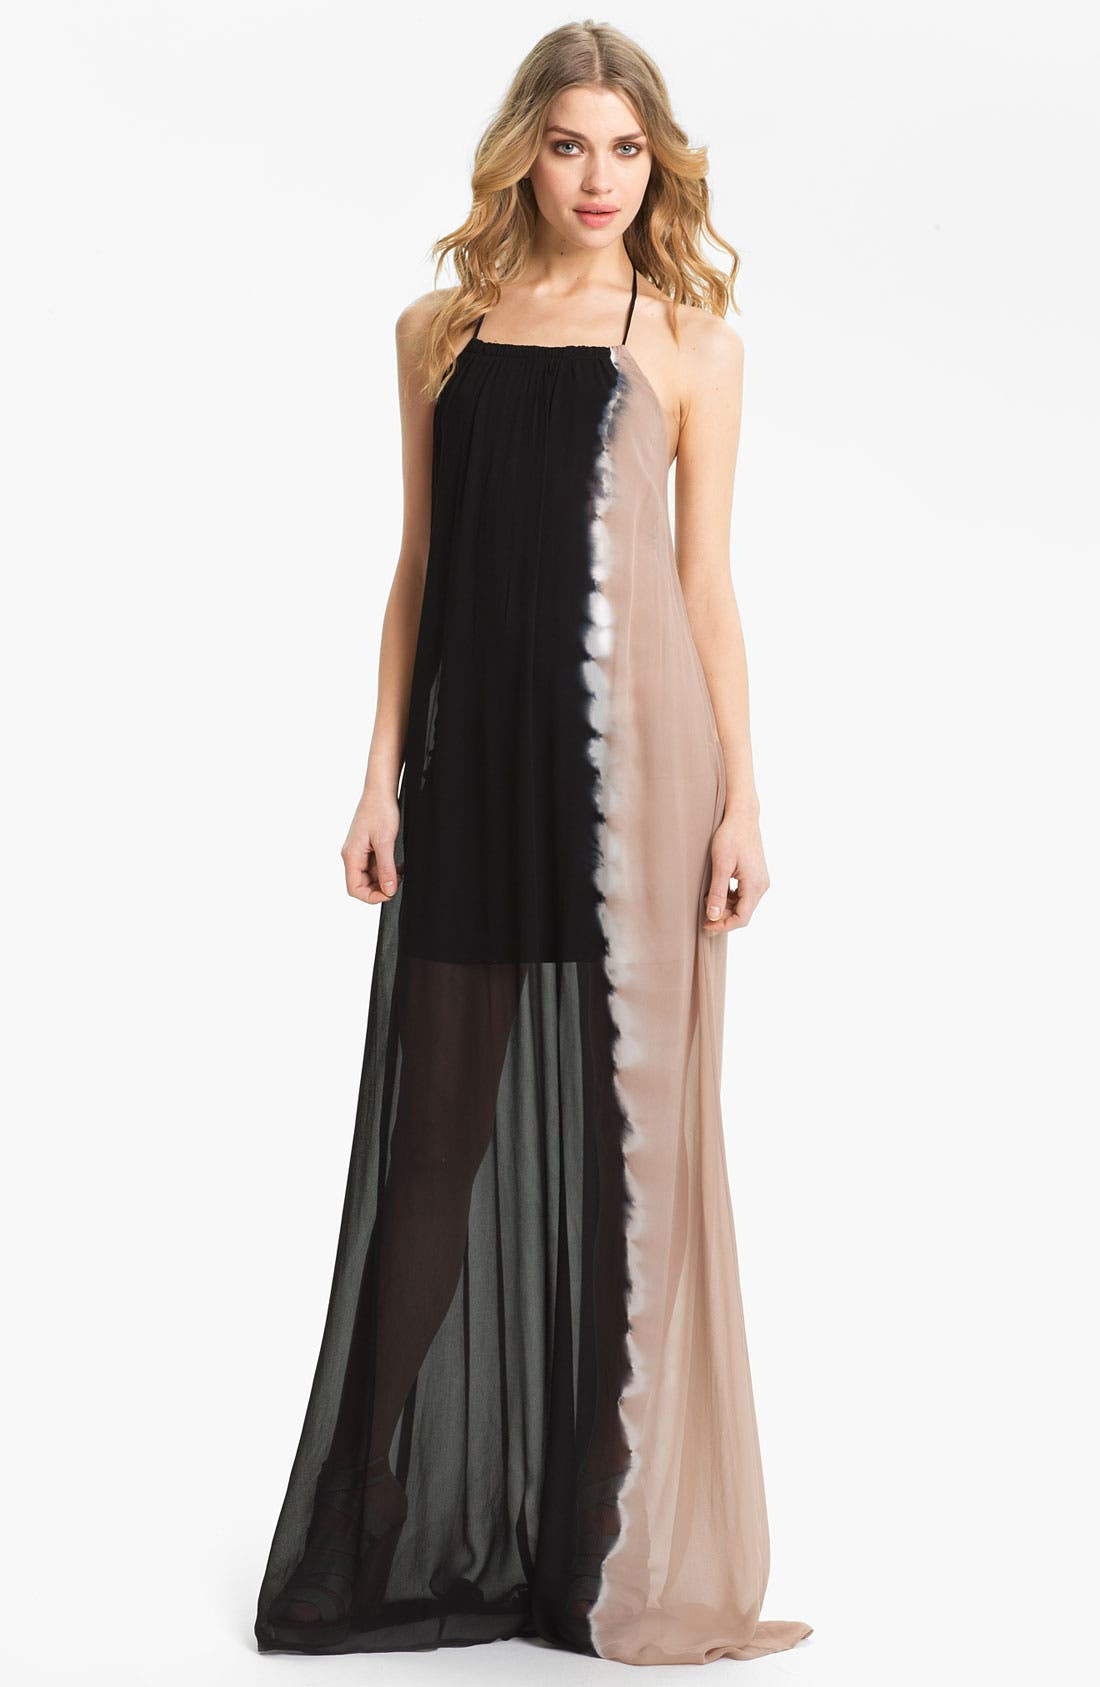 Alternate Image 1 Selected - Young, Fabulous & Broke 'Gila' Chiffon Maxi Dress